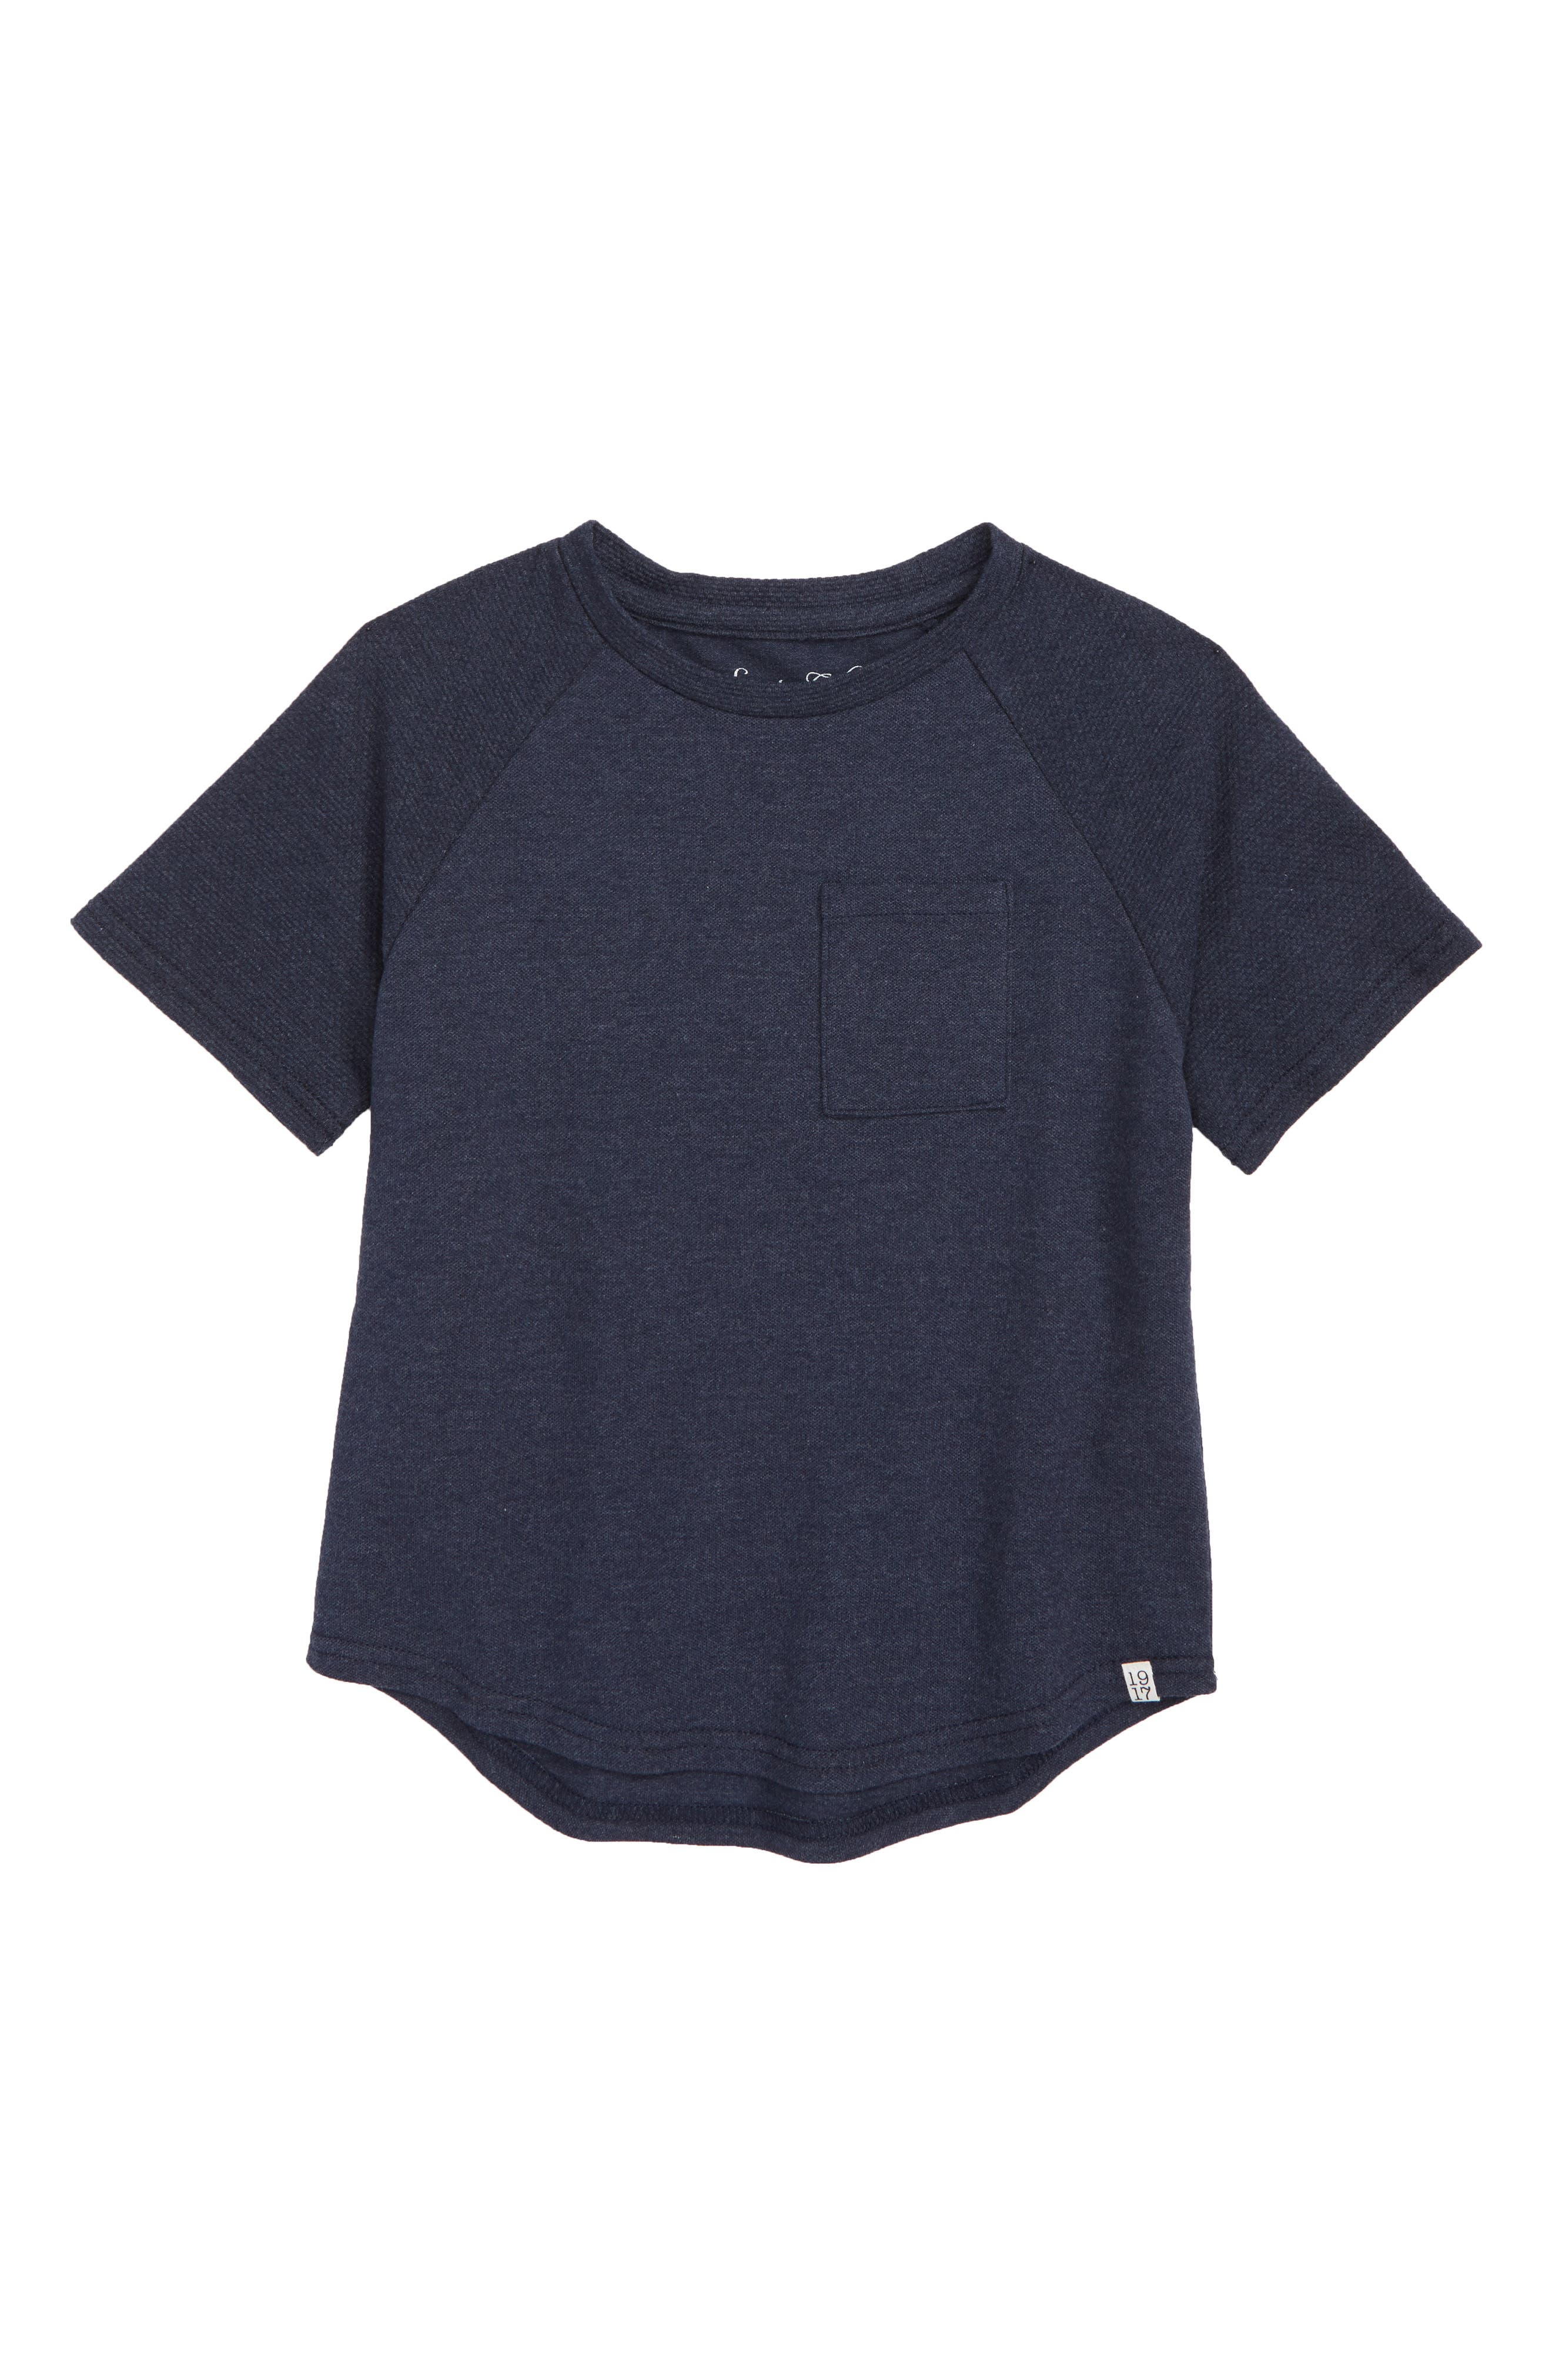 Suburb T-Shirt,                         Main,                         color, HEATHER NAVY PIQUE